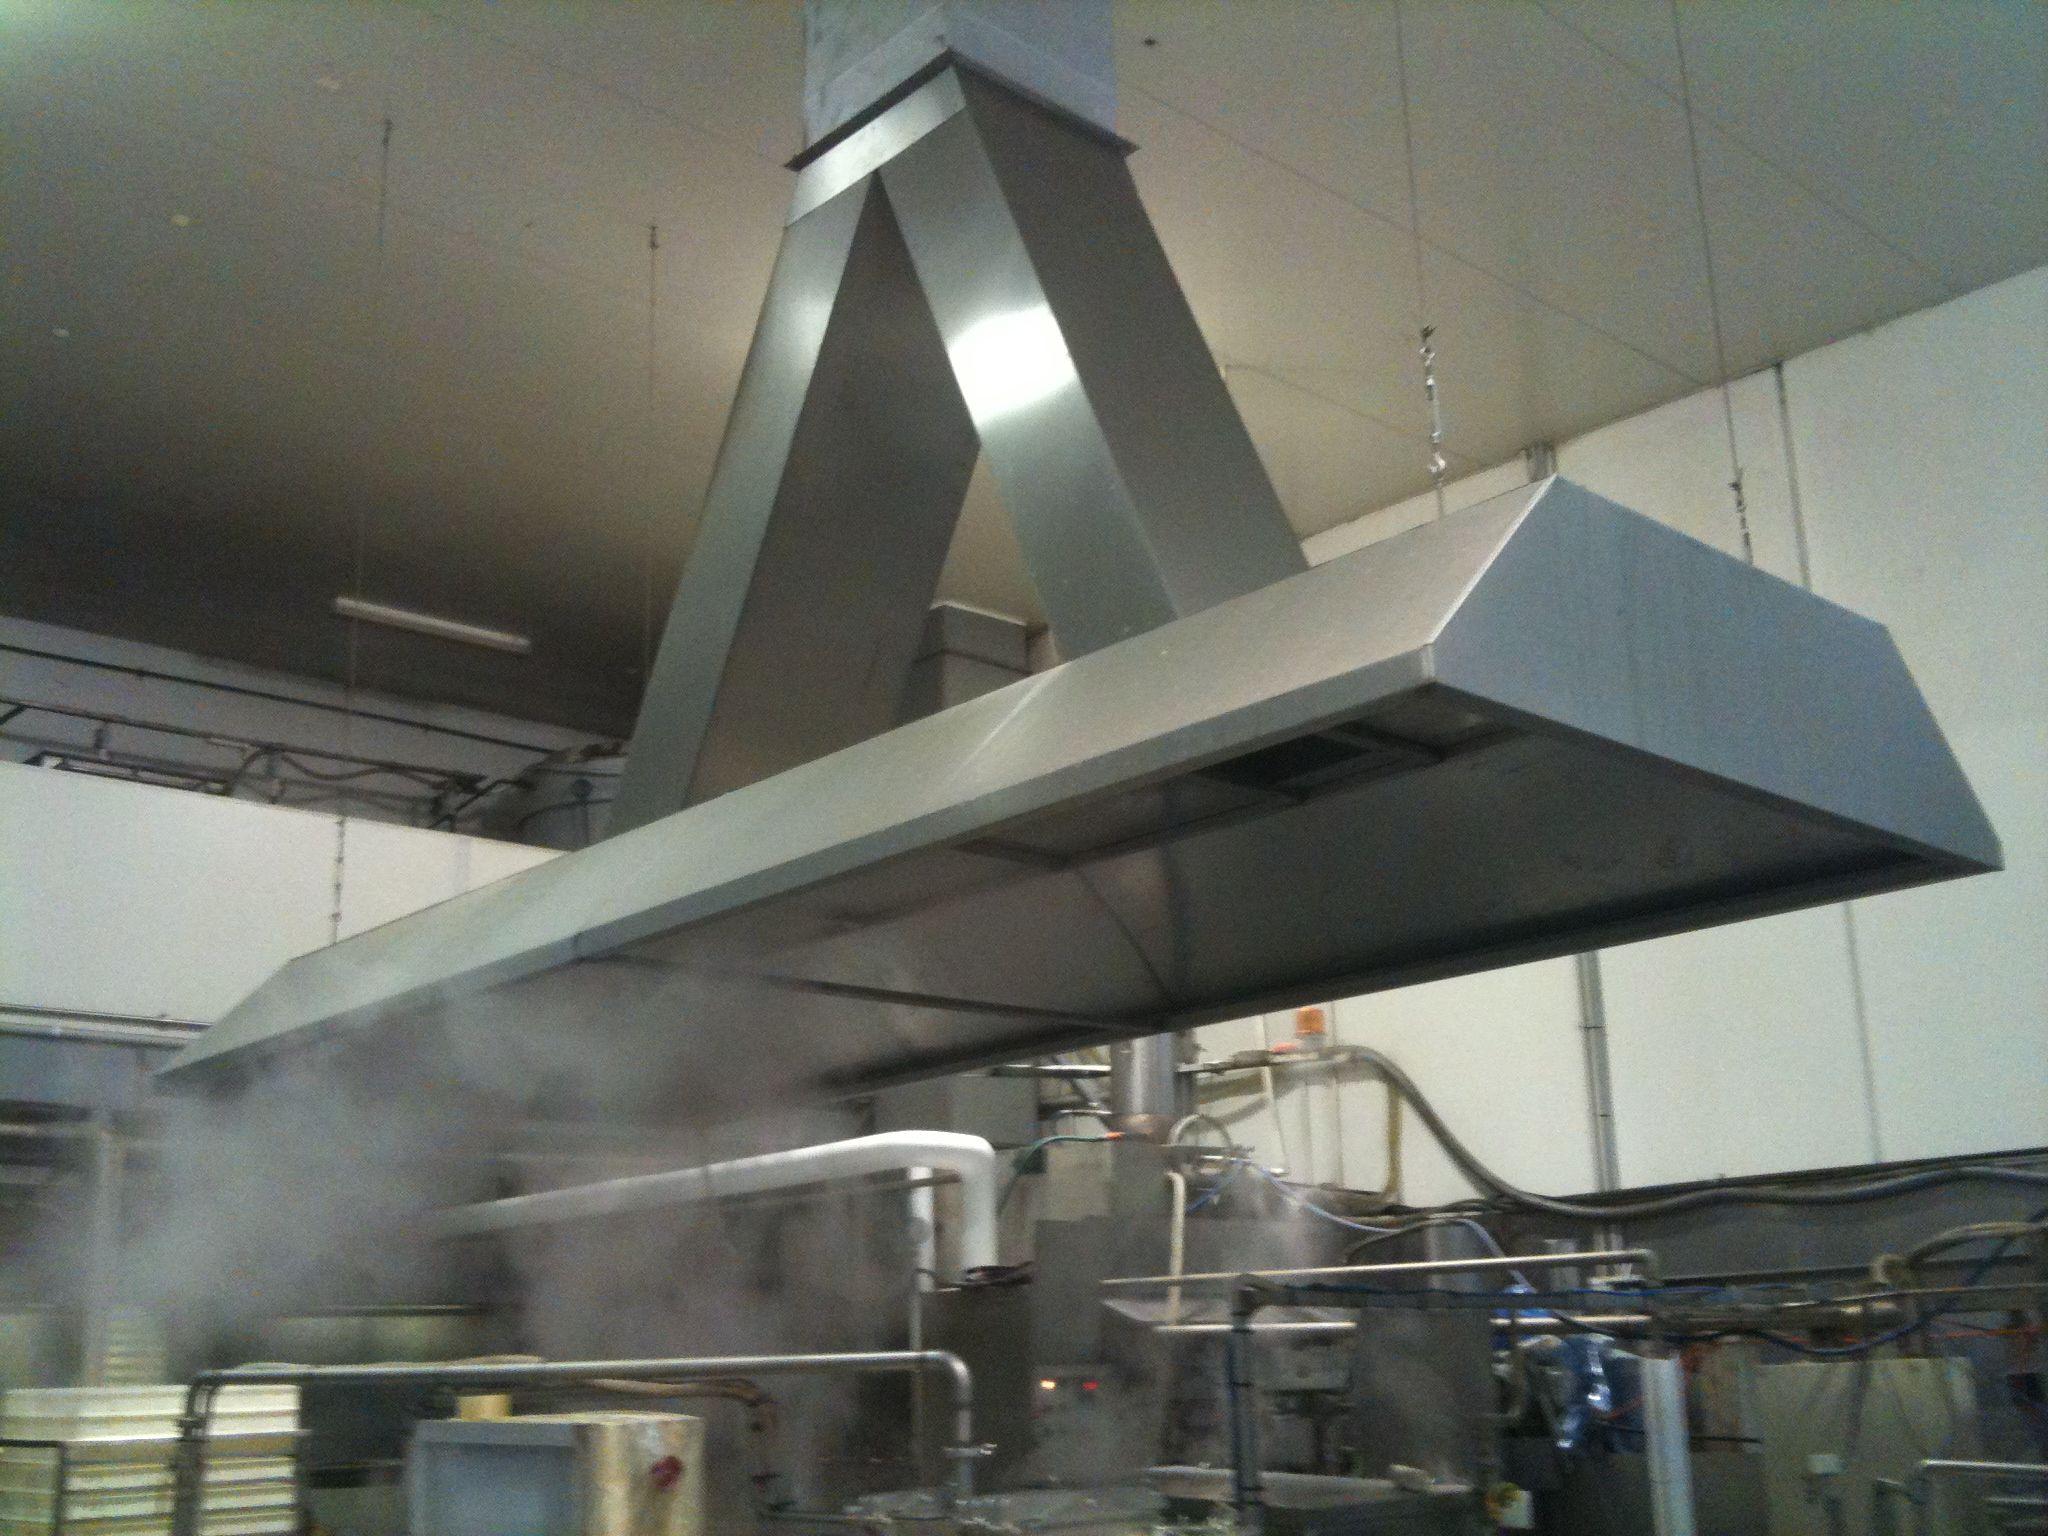 Exhaust Hoods Industrial : Industrial exhaust hood at a tofu factory mechanical